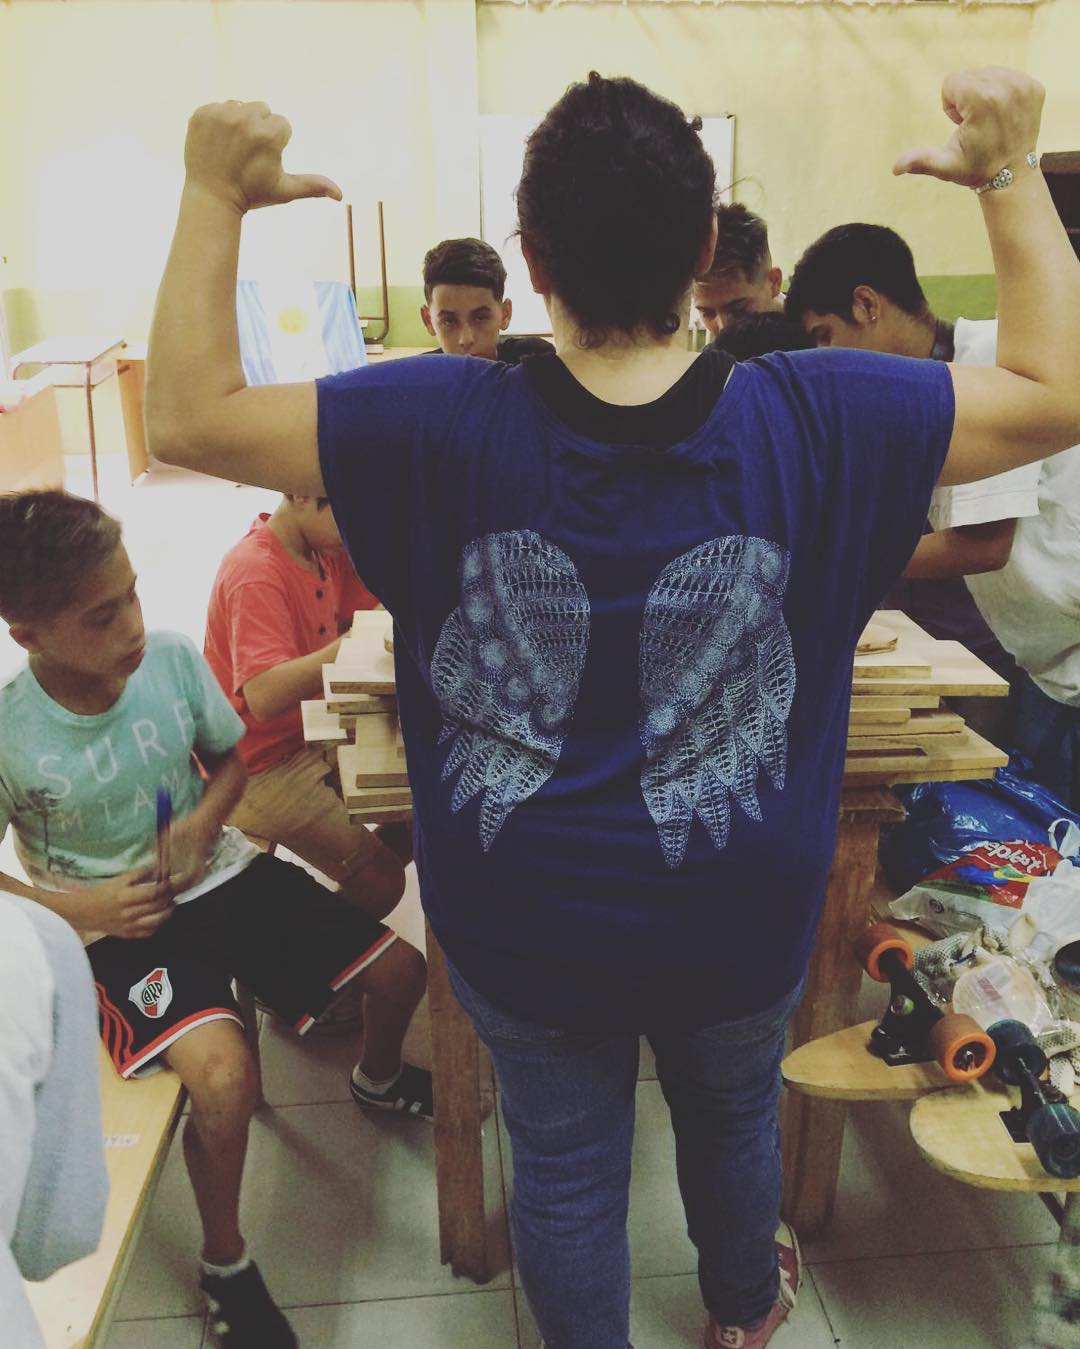 Vino el angel!! Arrancamos #laloma #vicentelopez #deslizate #skate